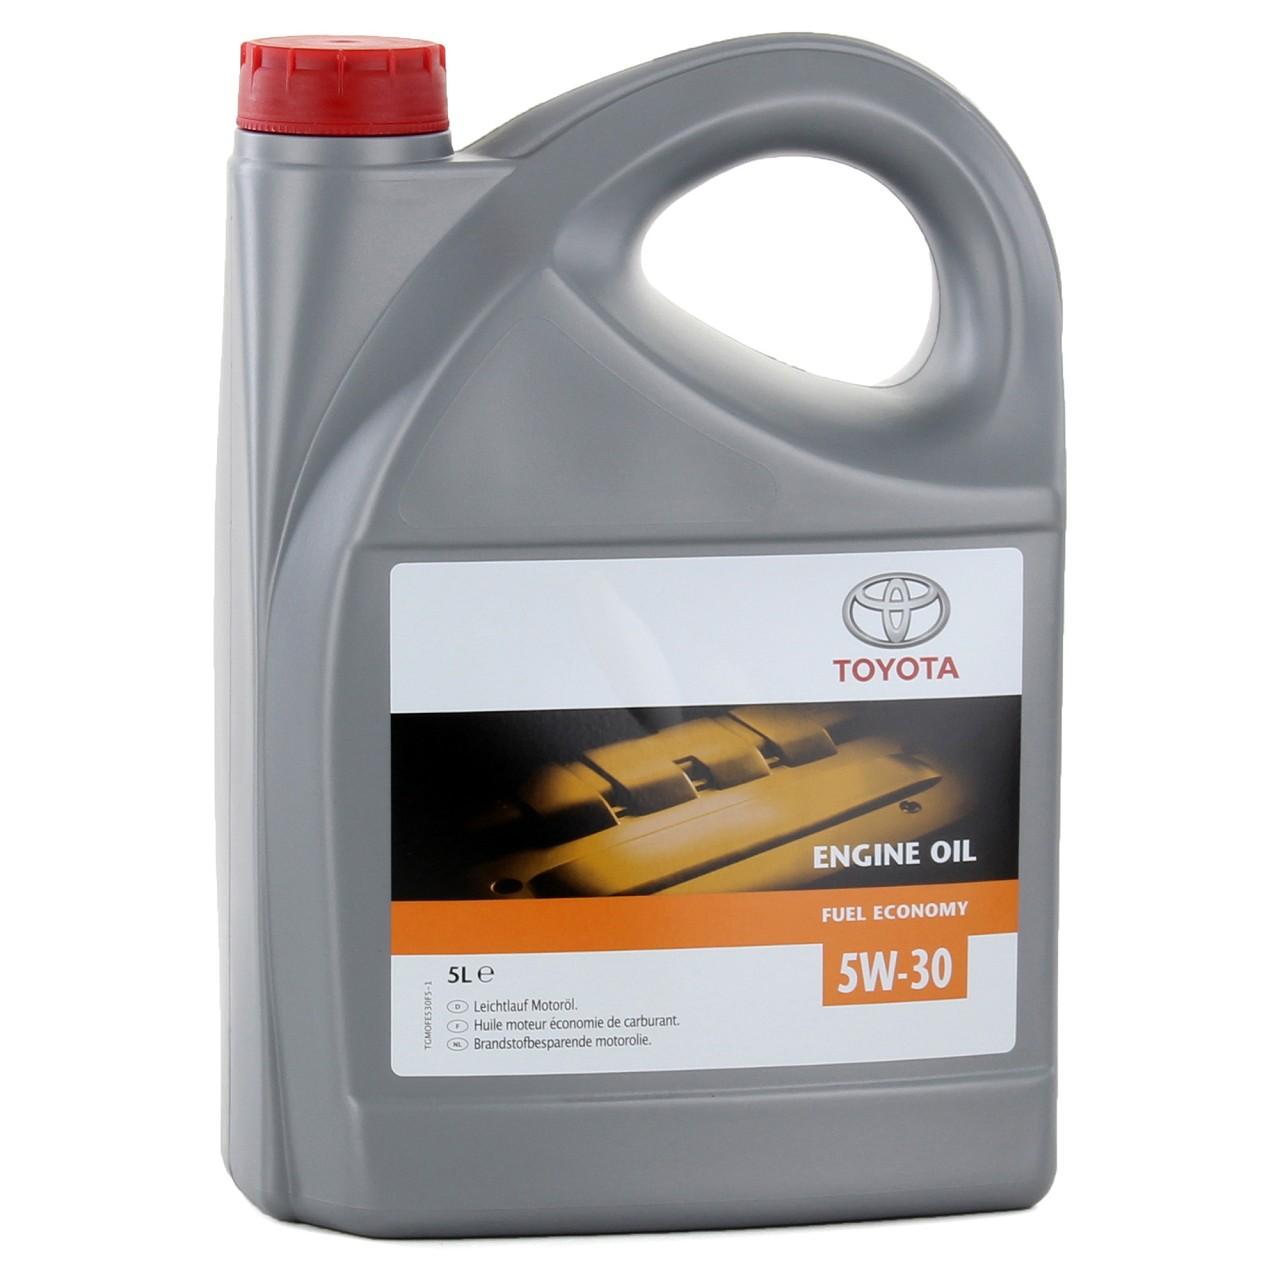 5L 5 Liter ORIGINAL Toyota Motoröl Öl FUEL ECONOMY 5W-30 5W30 08880-80845